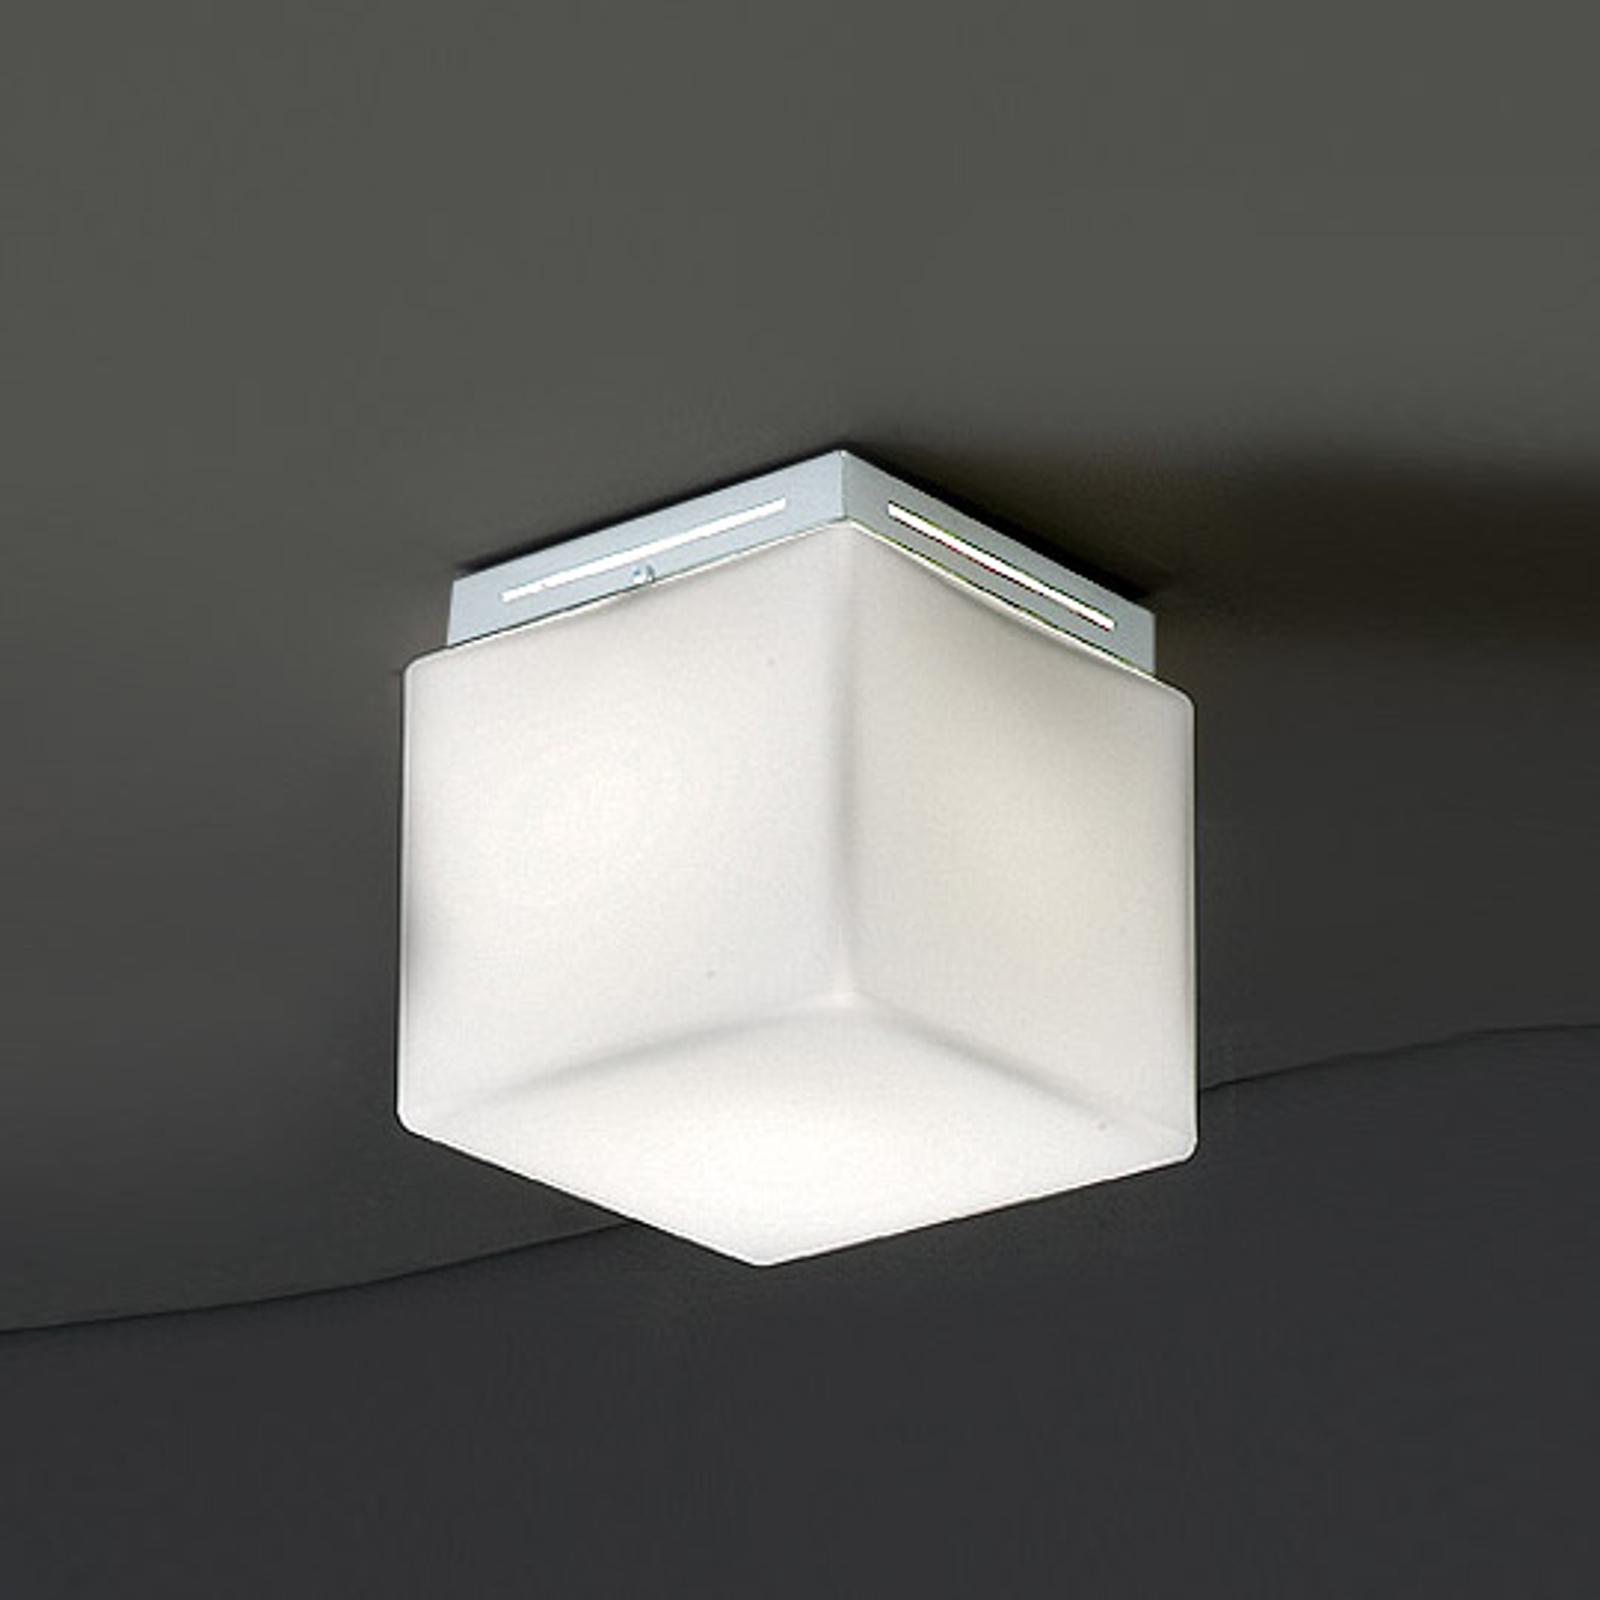 Plafondlamp Cubis, wit